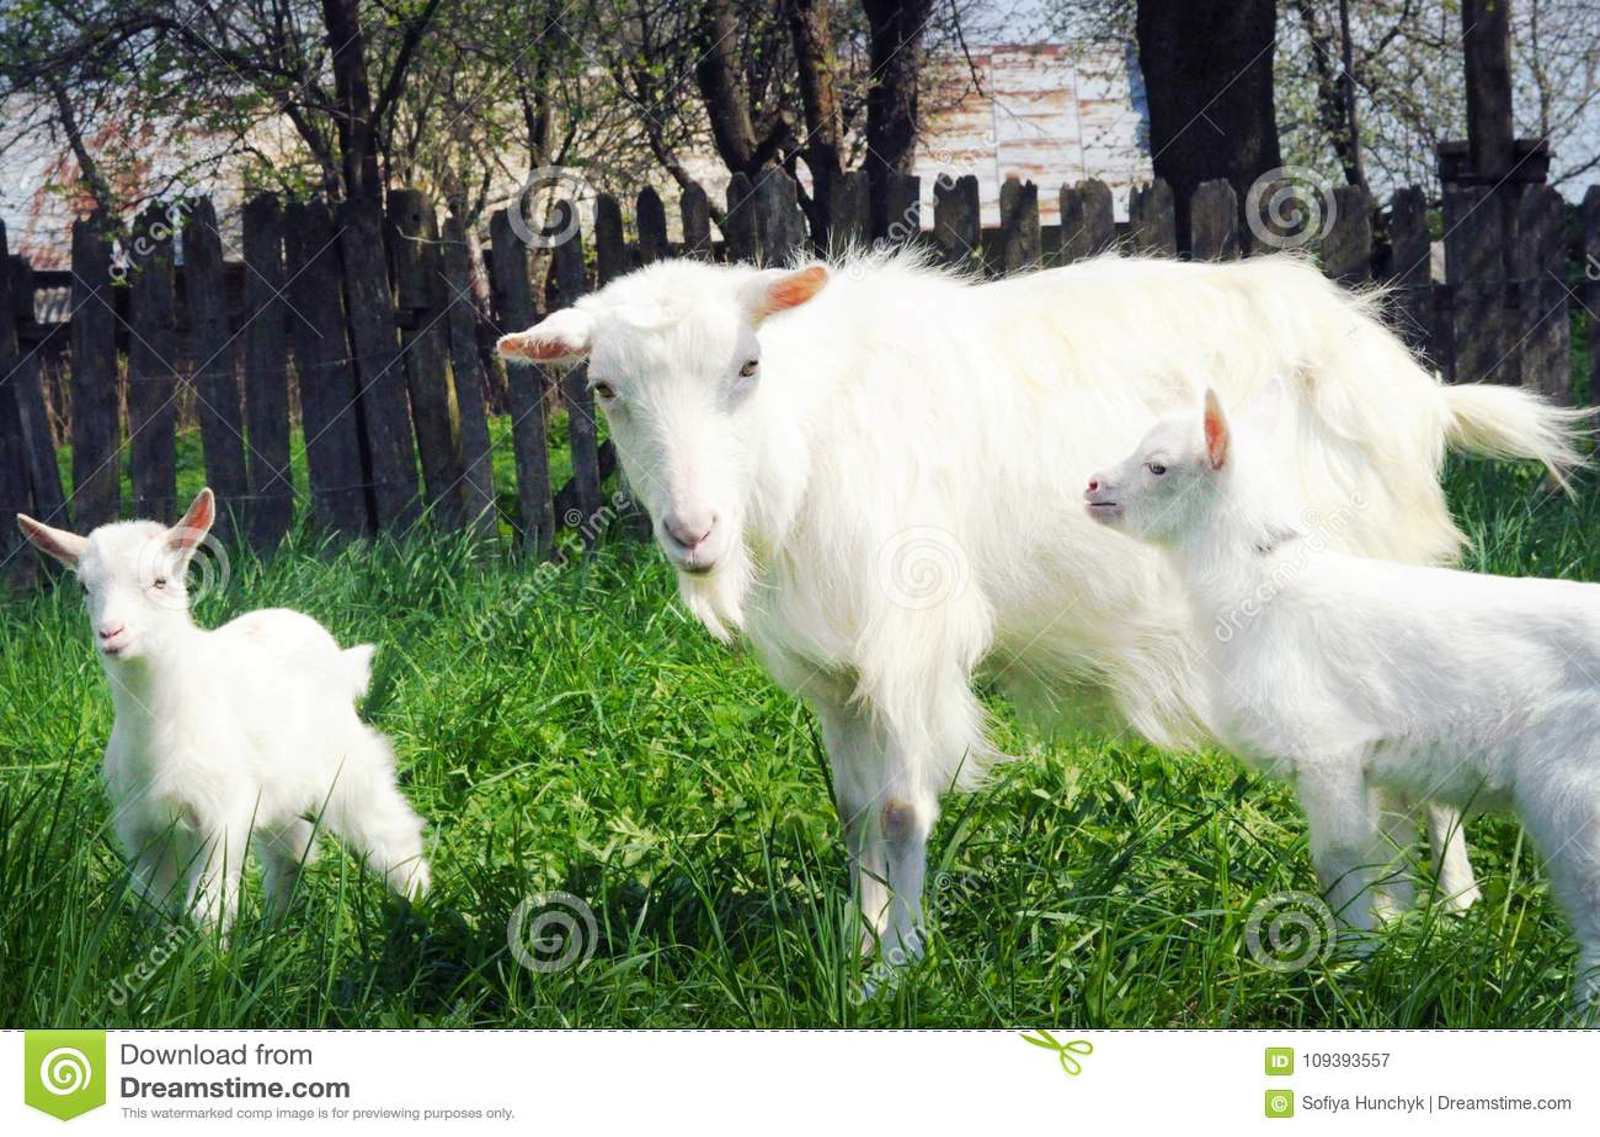 Three white goats standing among green grass